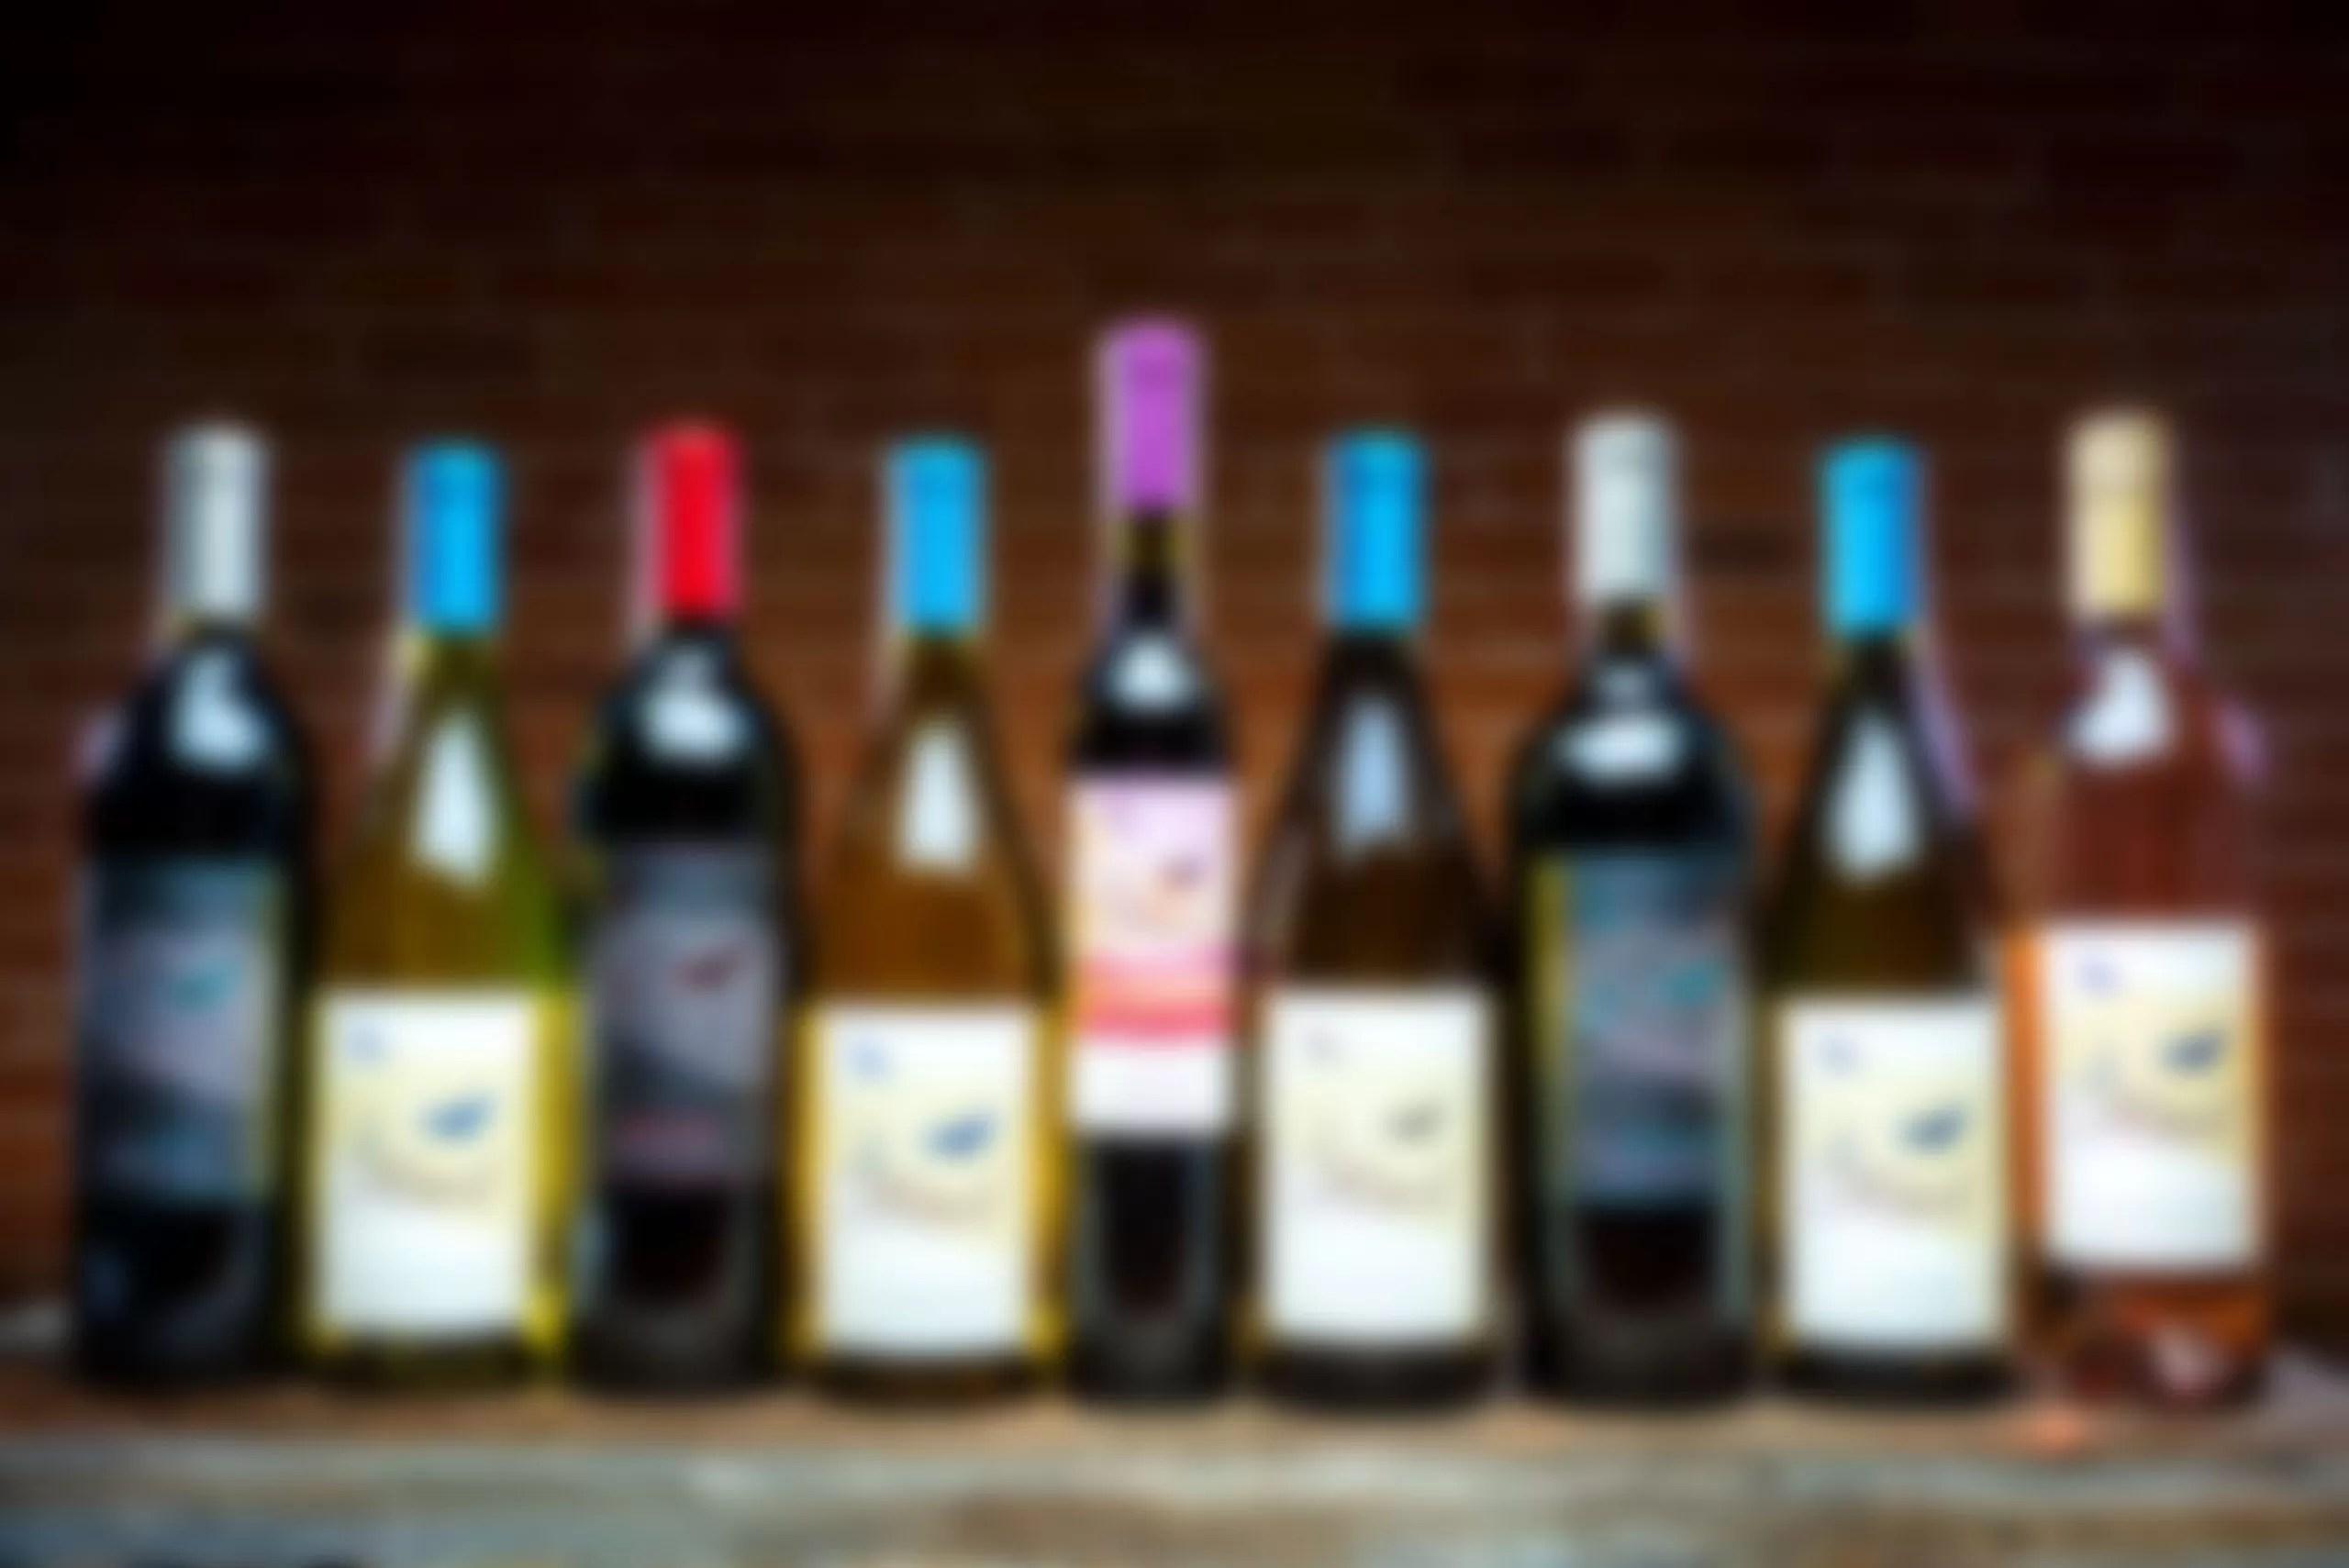 2Hawk Vineyard and Winery Bottles